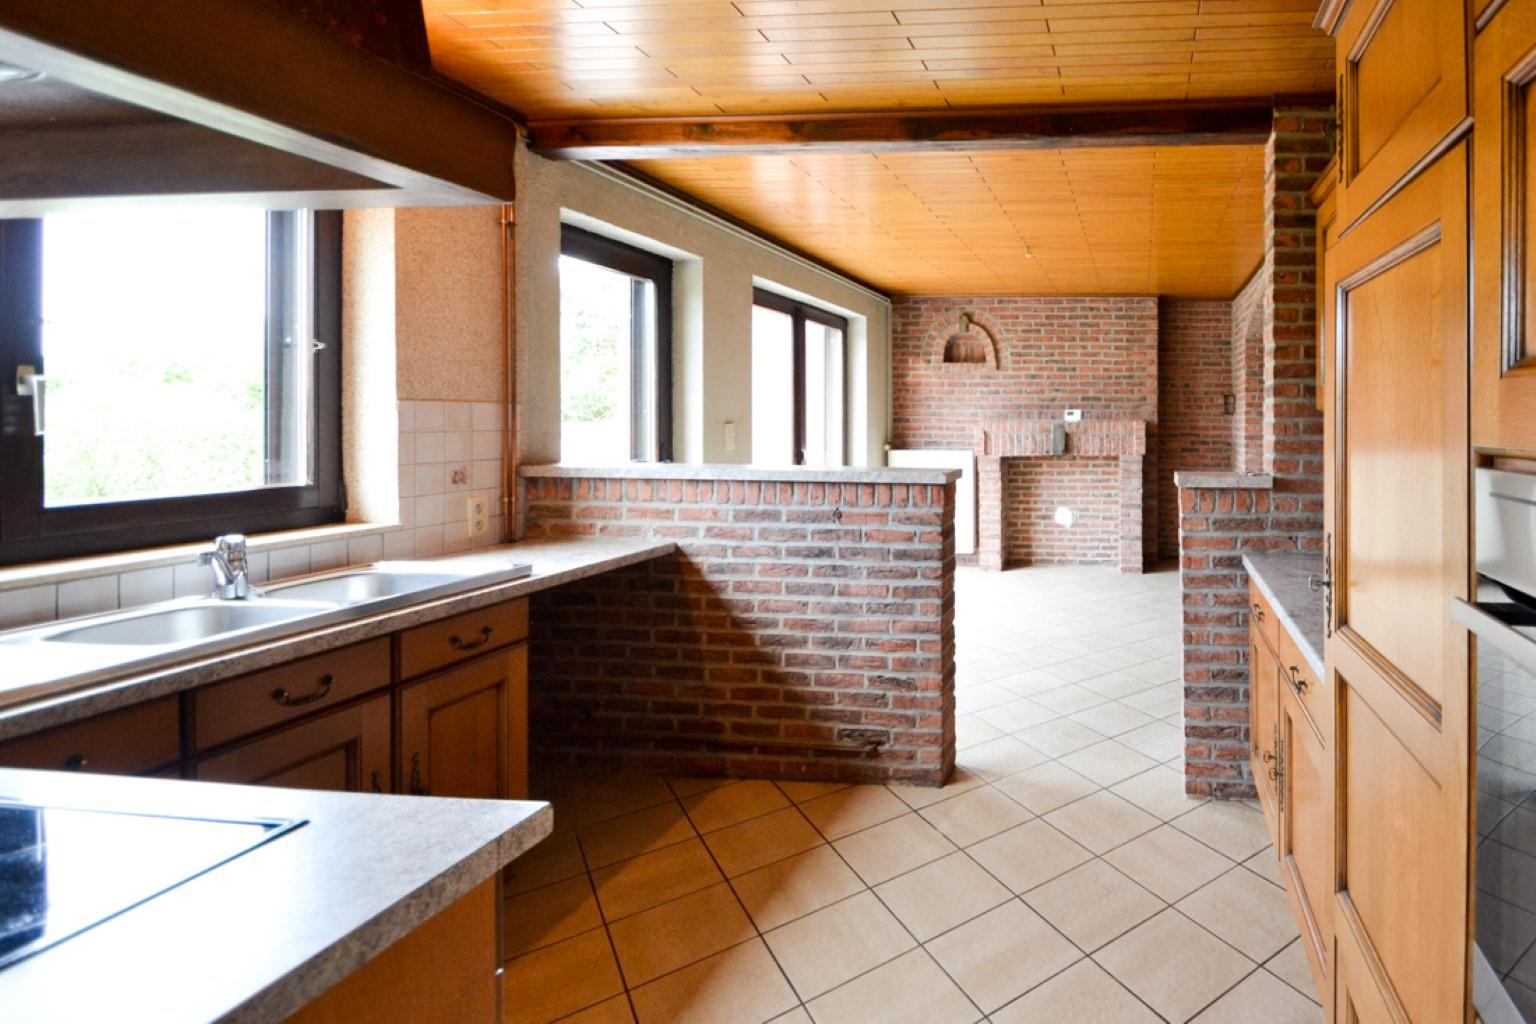 Maison - Leval-Trahegnies - #3049397-5